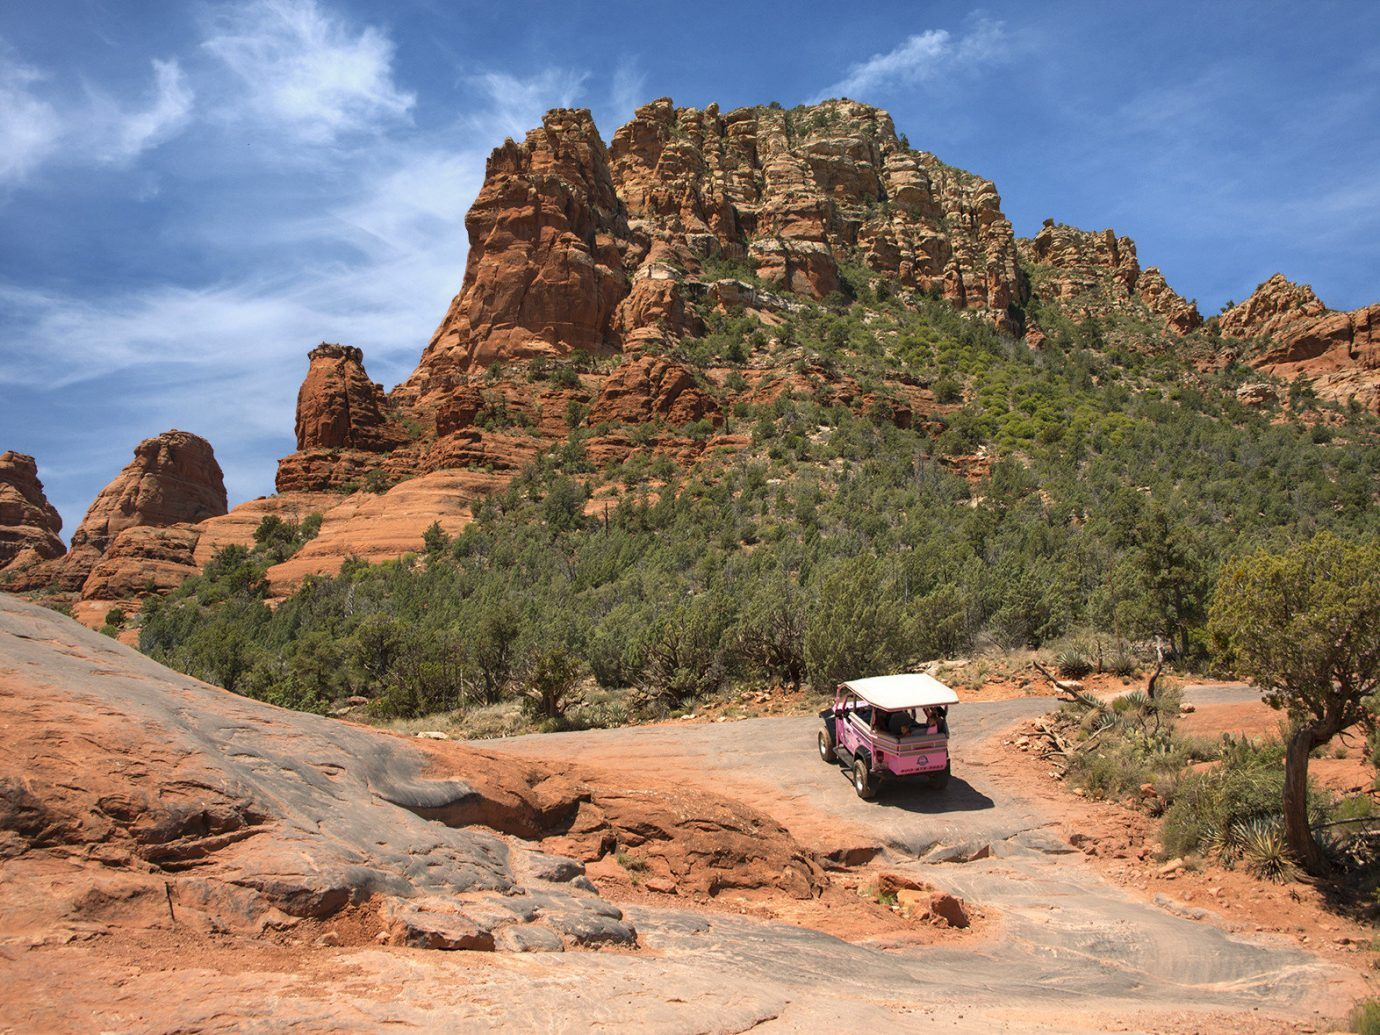 7 Cool Things to Do in Sedona | Outdoors adventure, Sedona